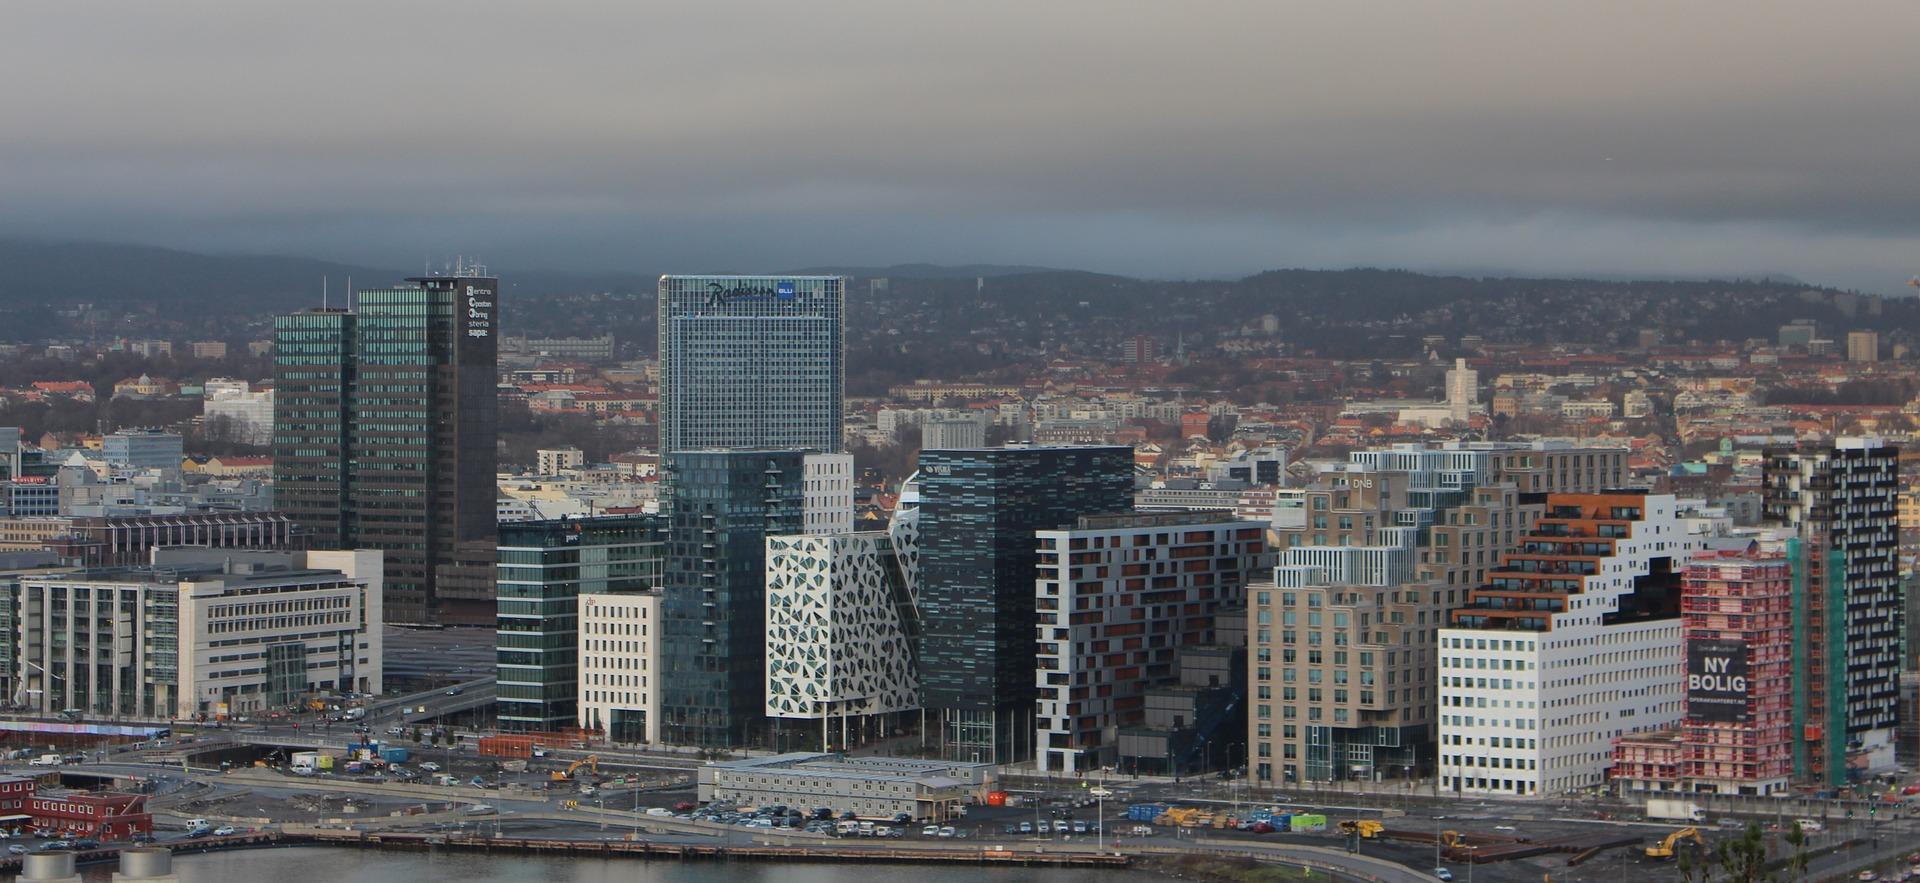 Oslo, capital of Norway